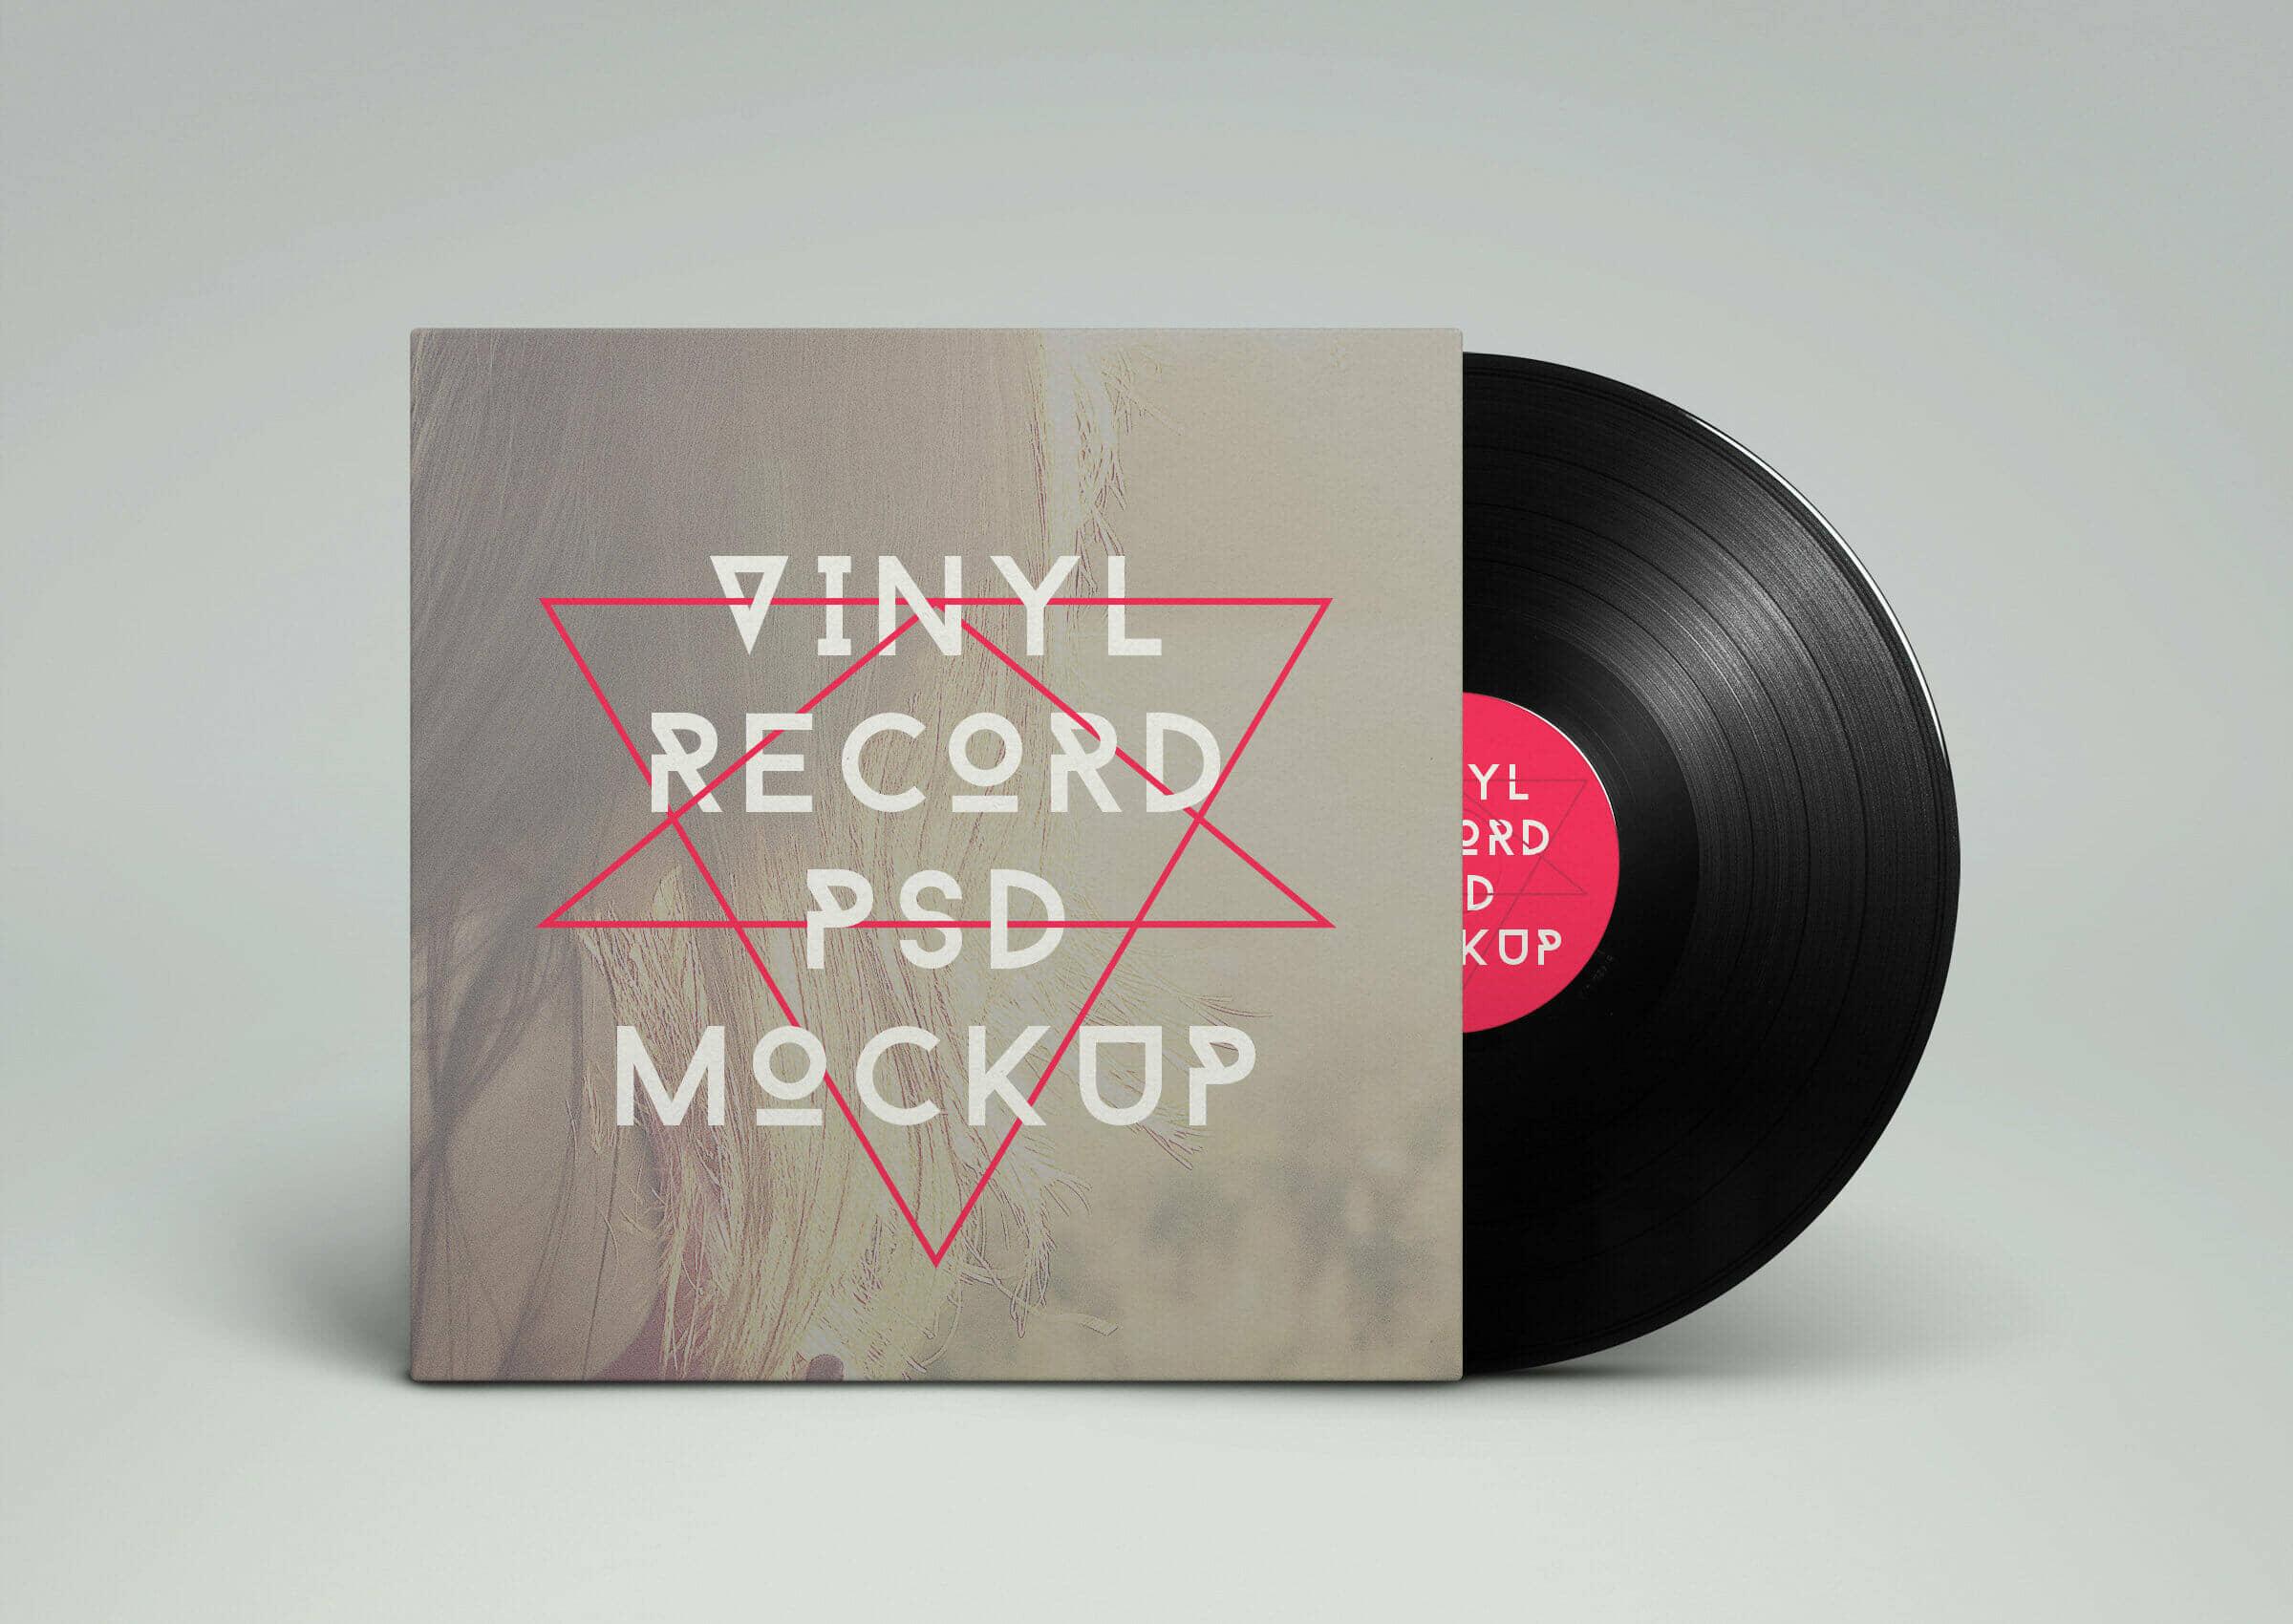 Artistic Vinyl Record Mockup